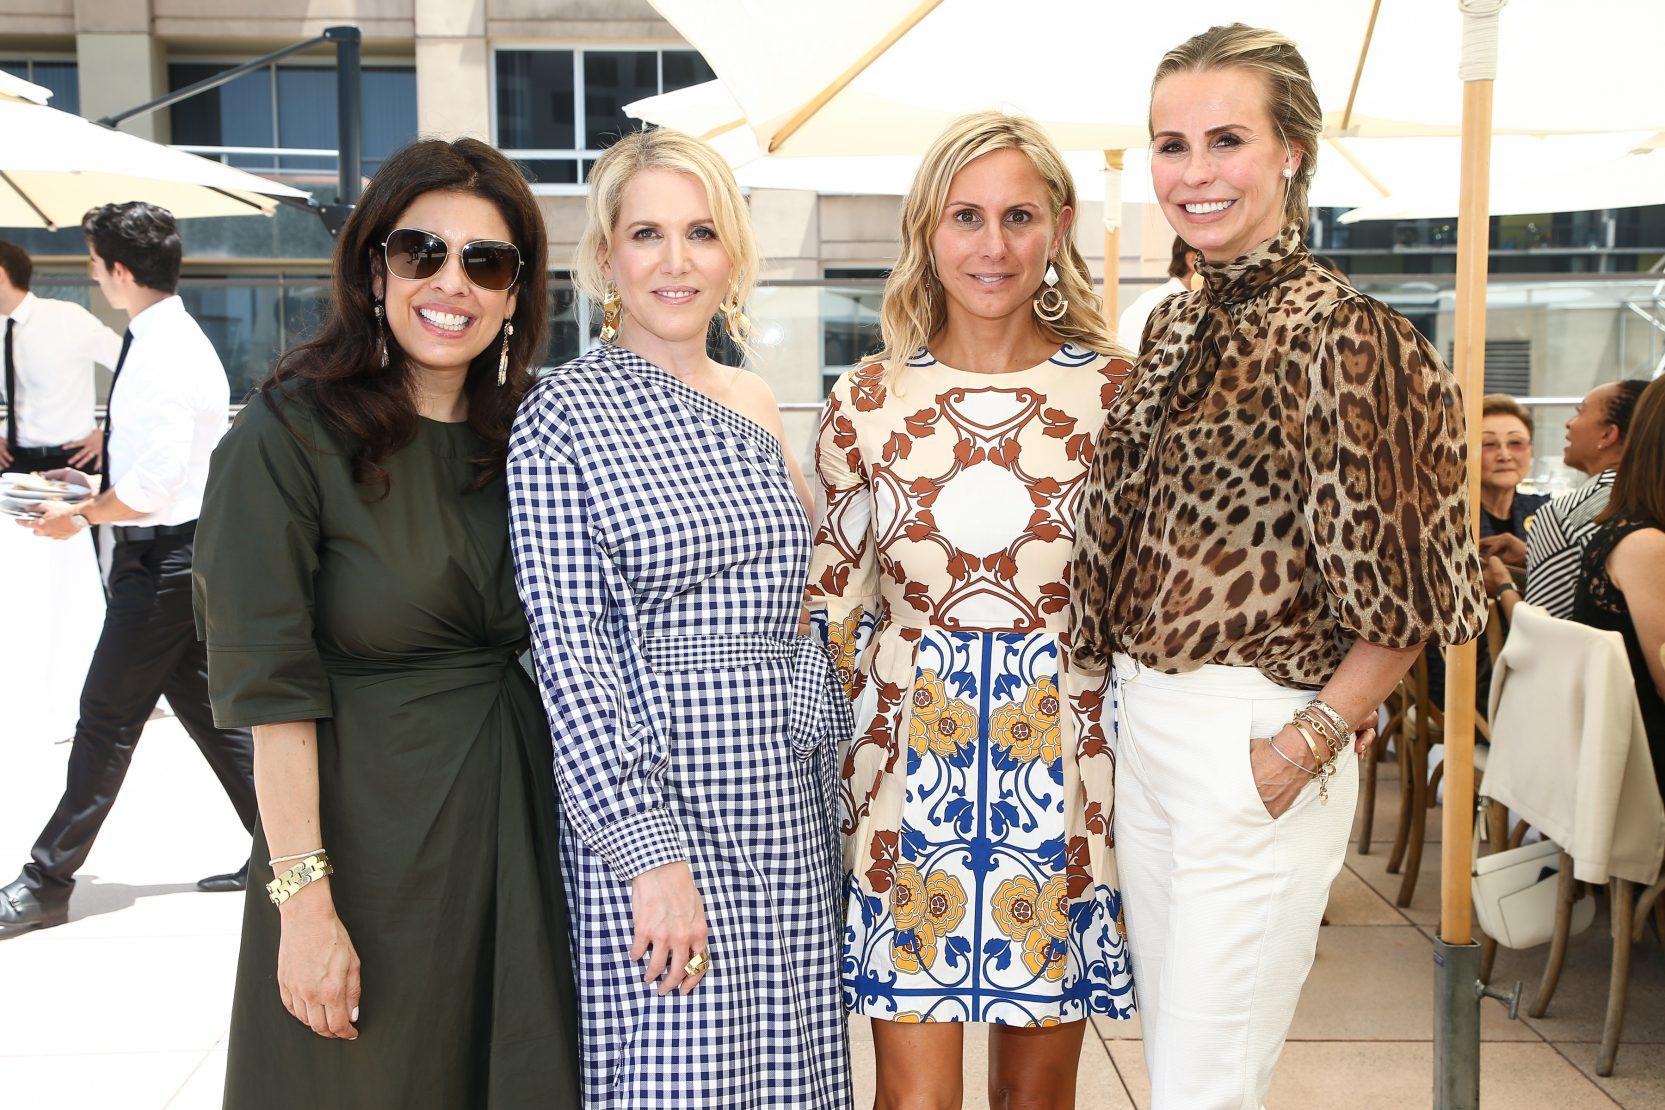 Natasha Baradaran, Shari Glazer, Stacy Cramer and Natasha Croxall